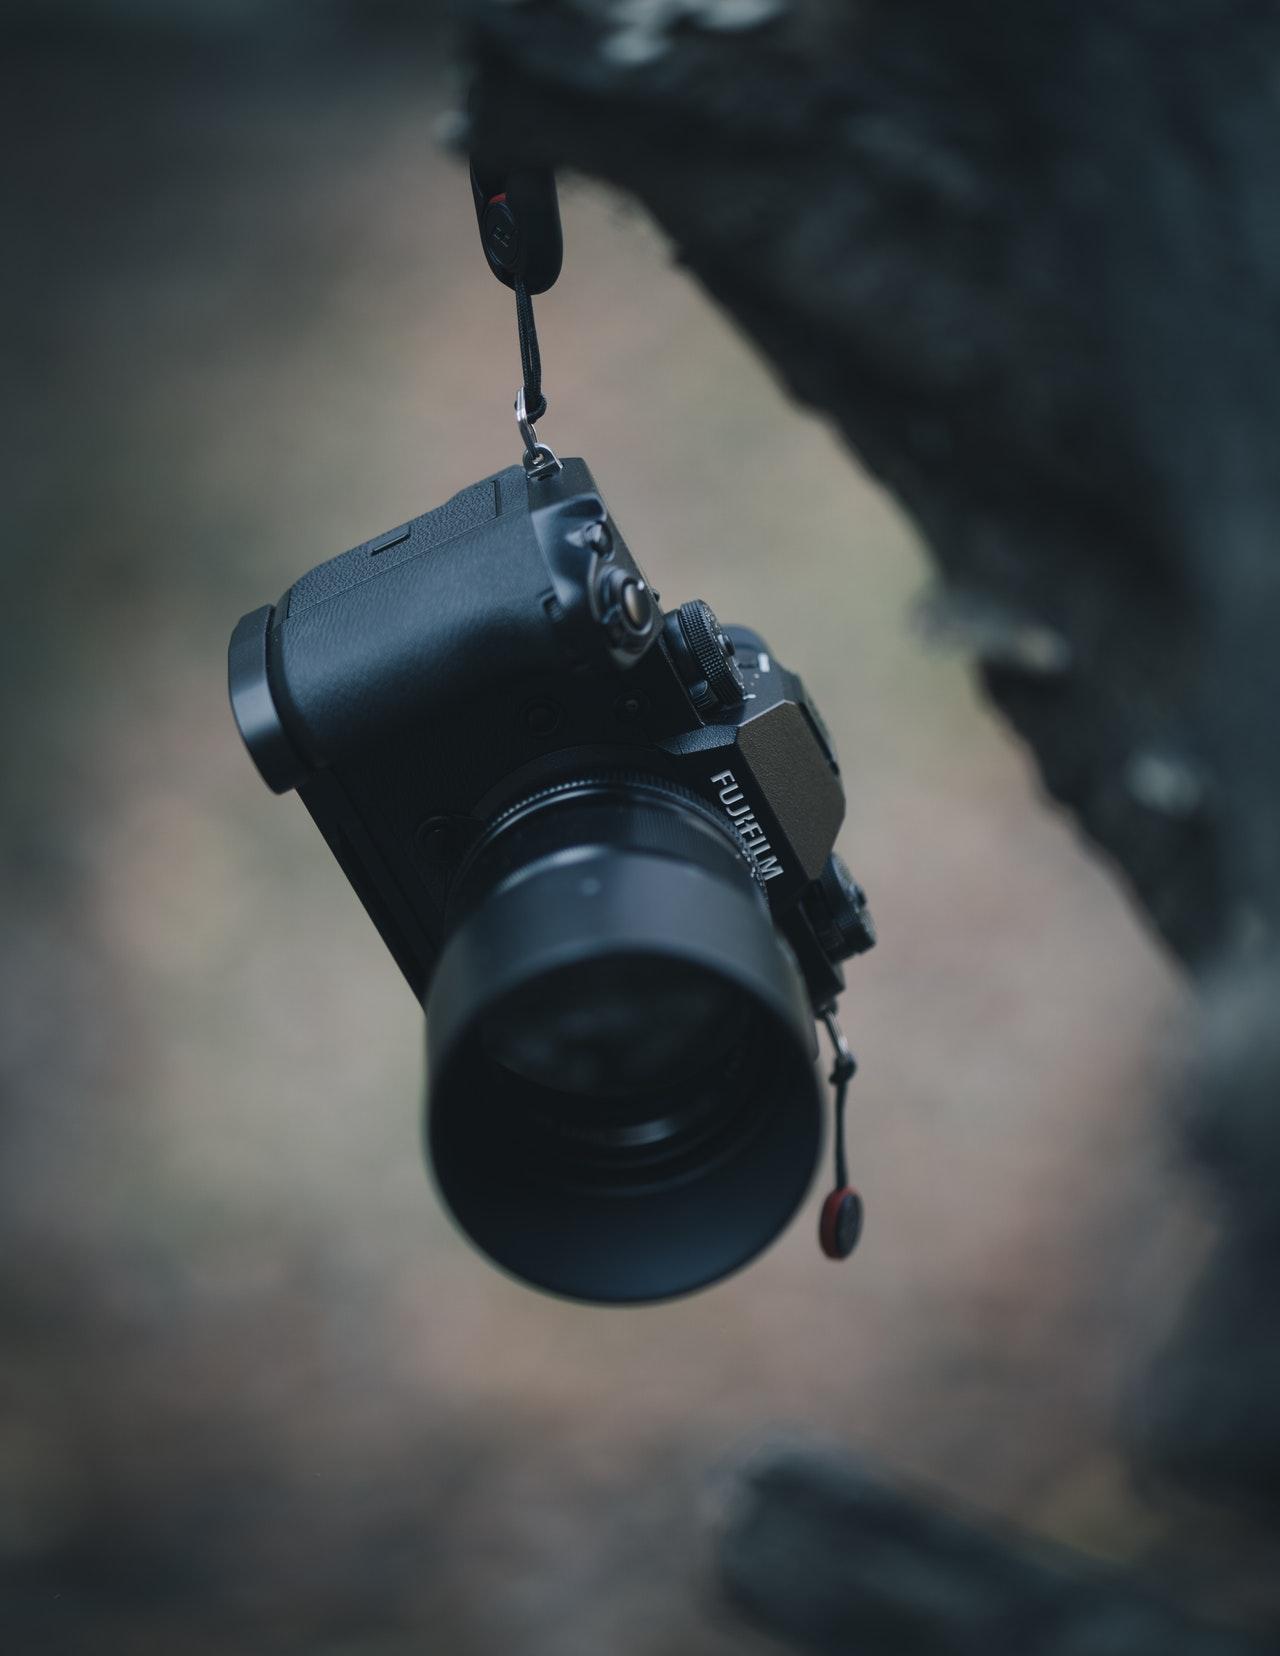 selective focus photography of fujifilm camera